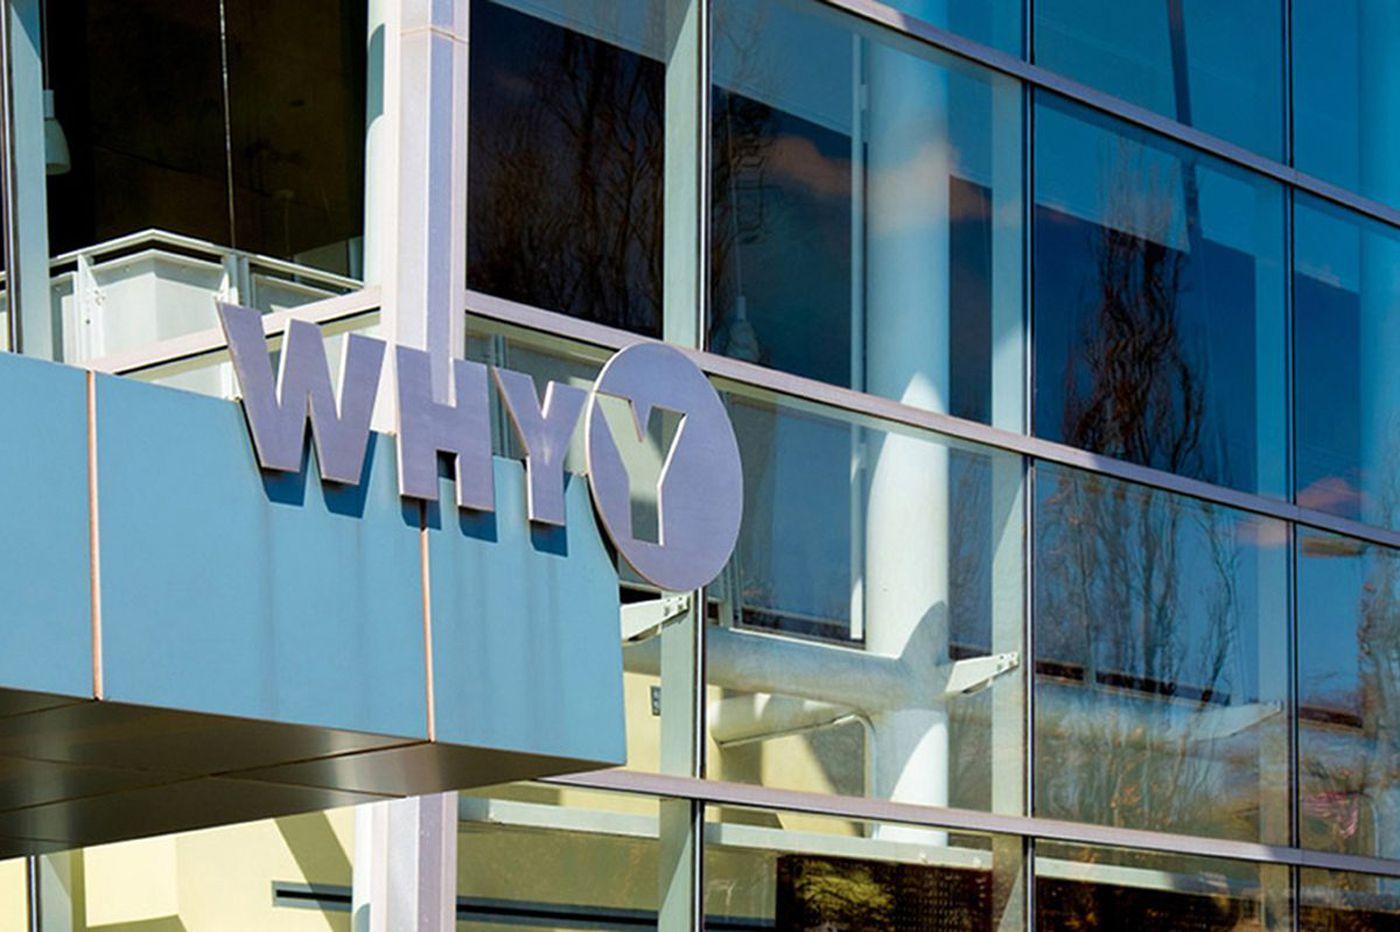 WHYY says goodbye to Newsworks website